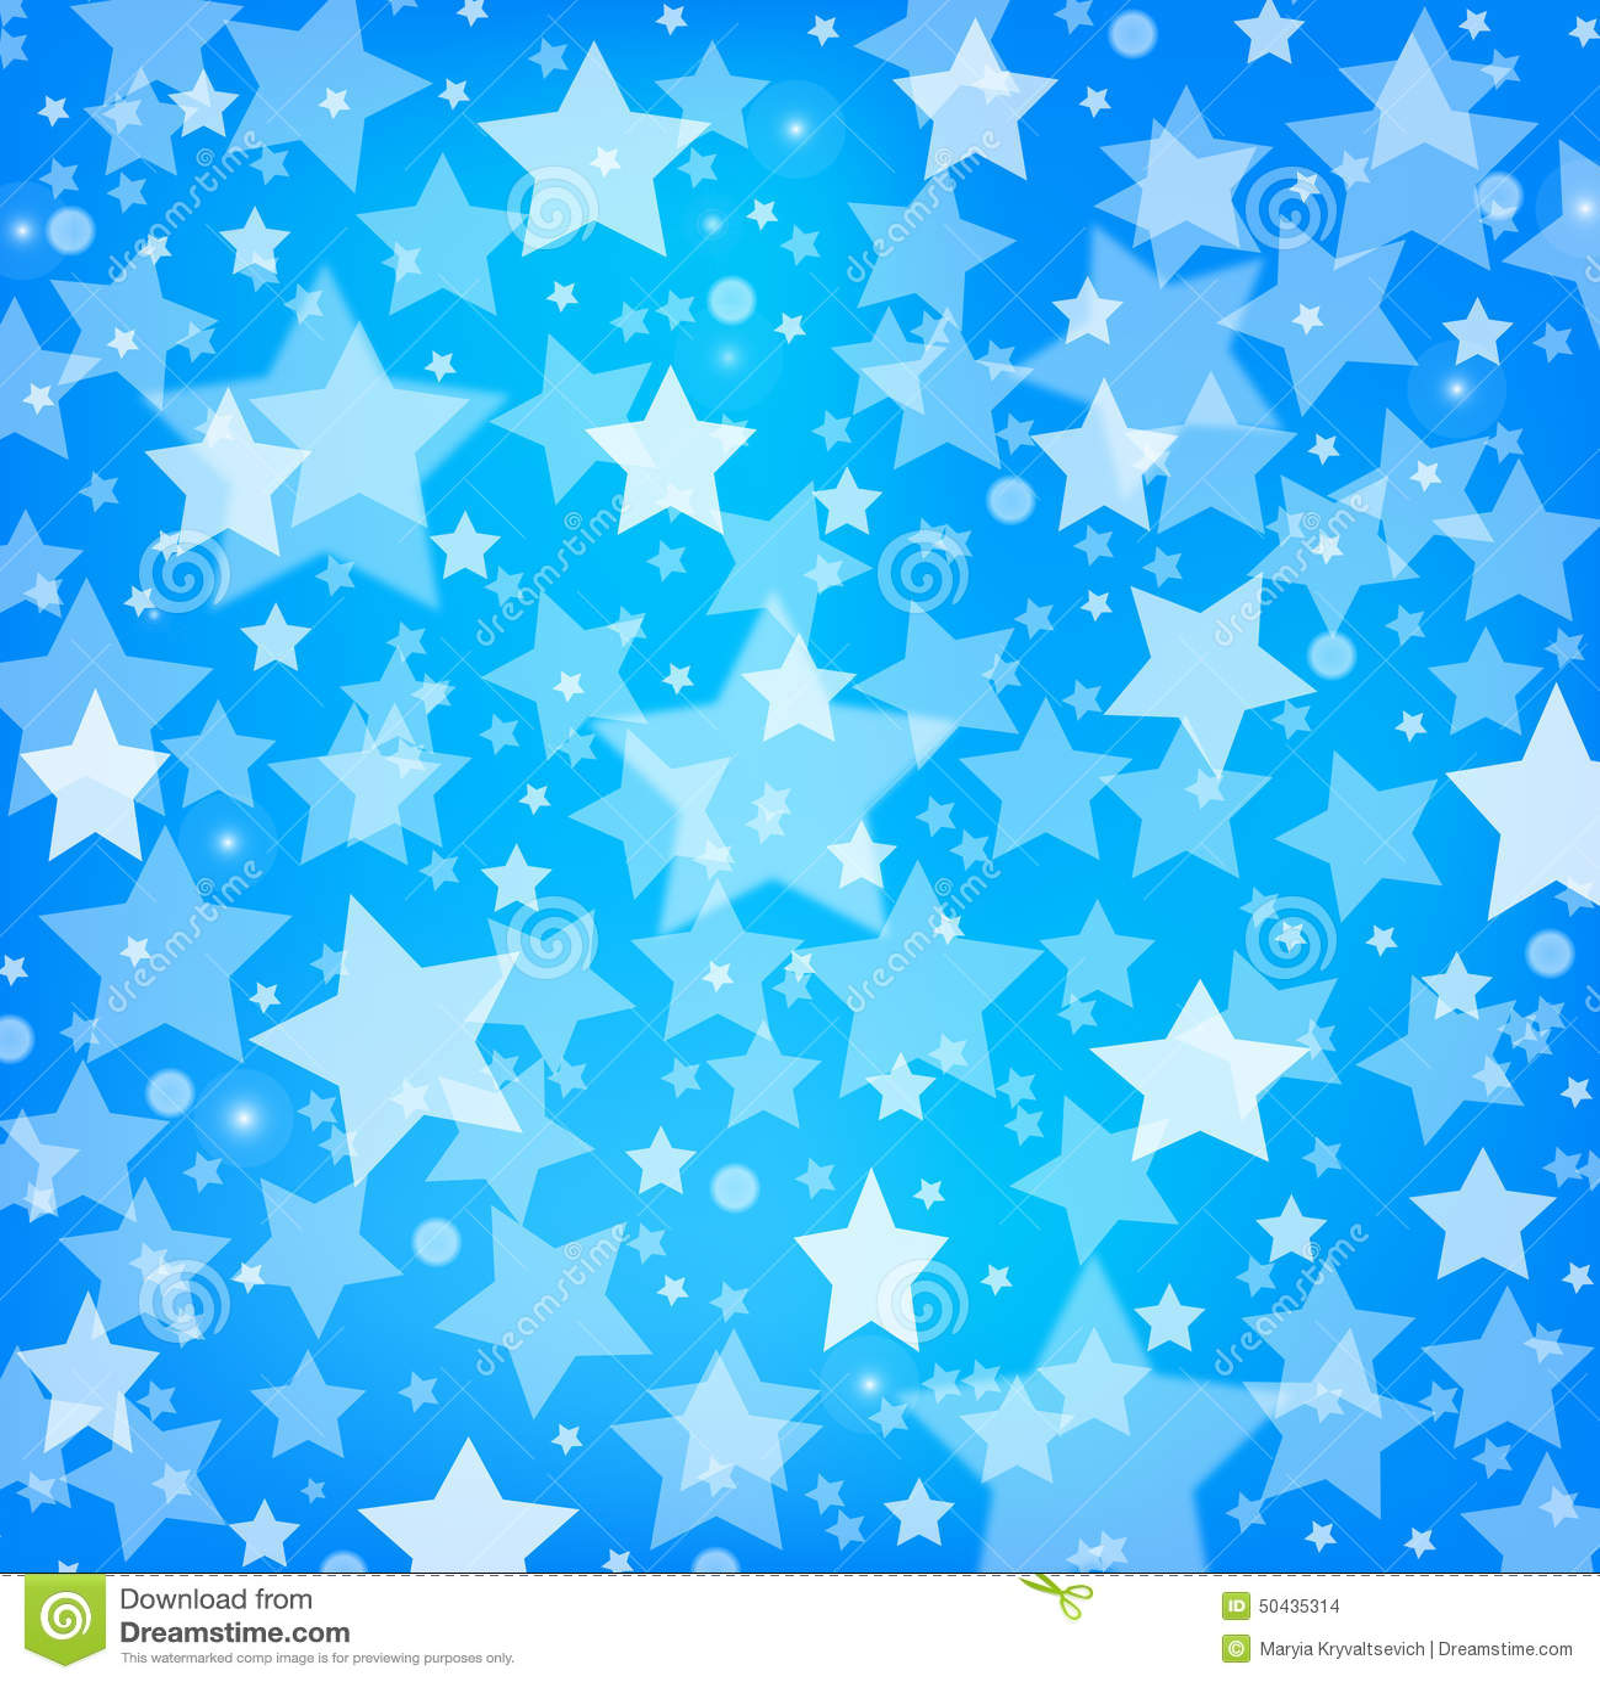 Baby blue star wallpaper